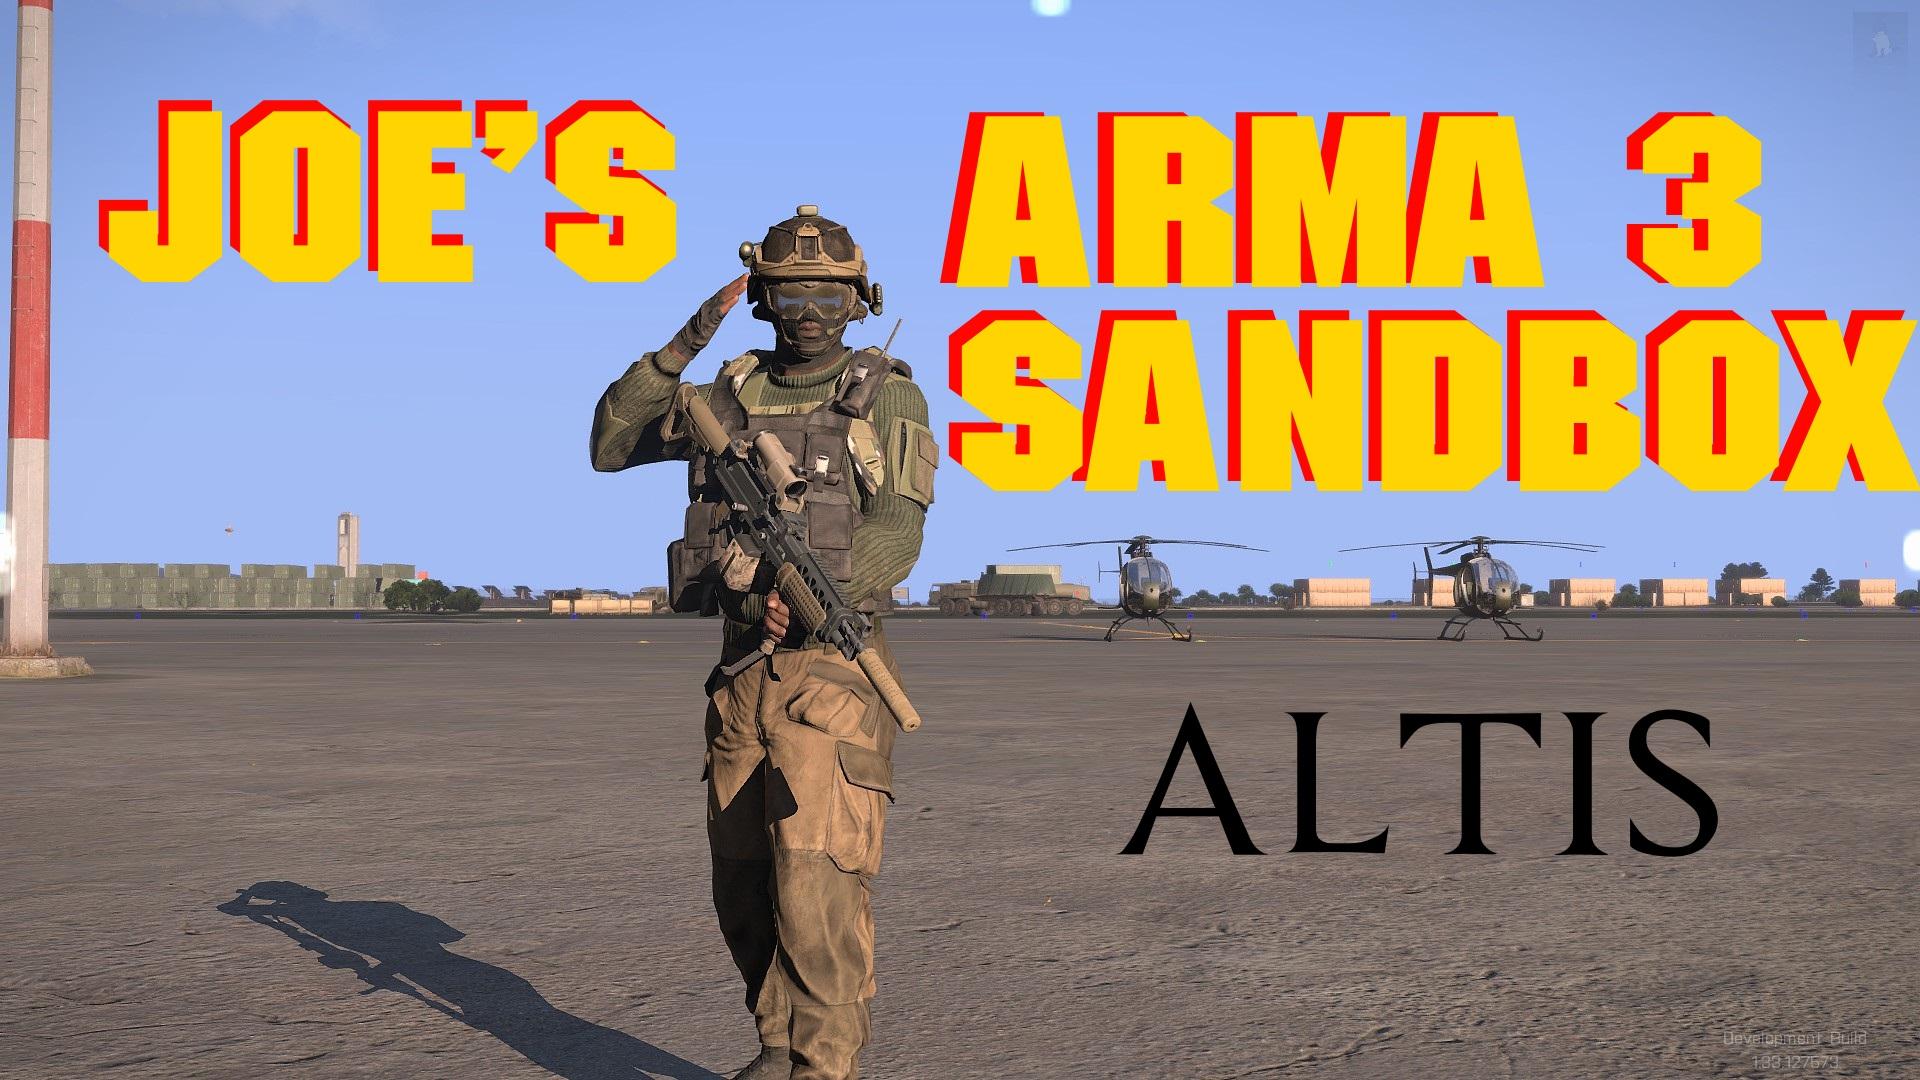 Arma 3 Sandbox [Altis]